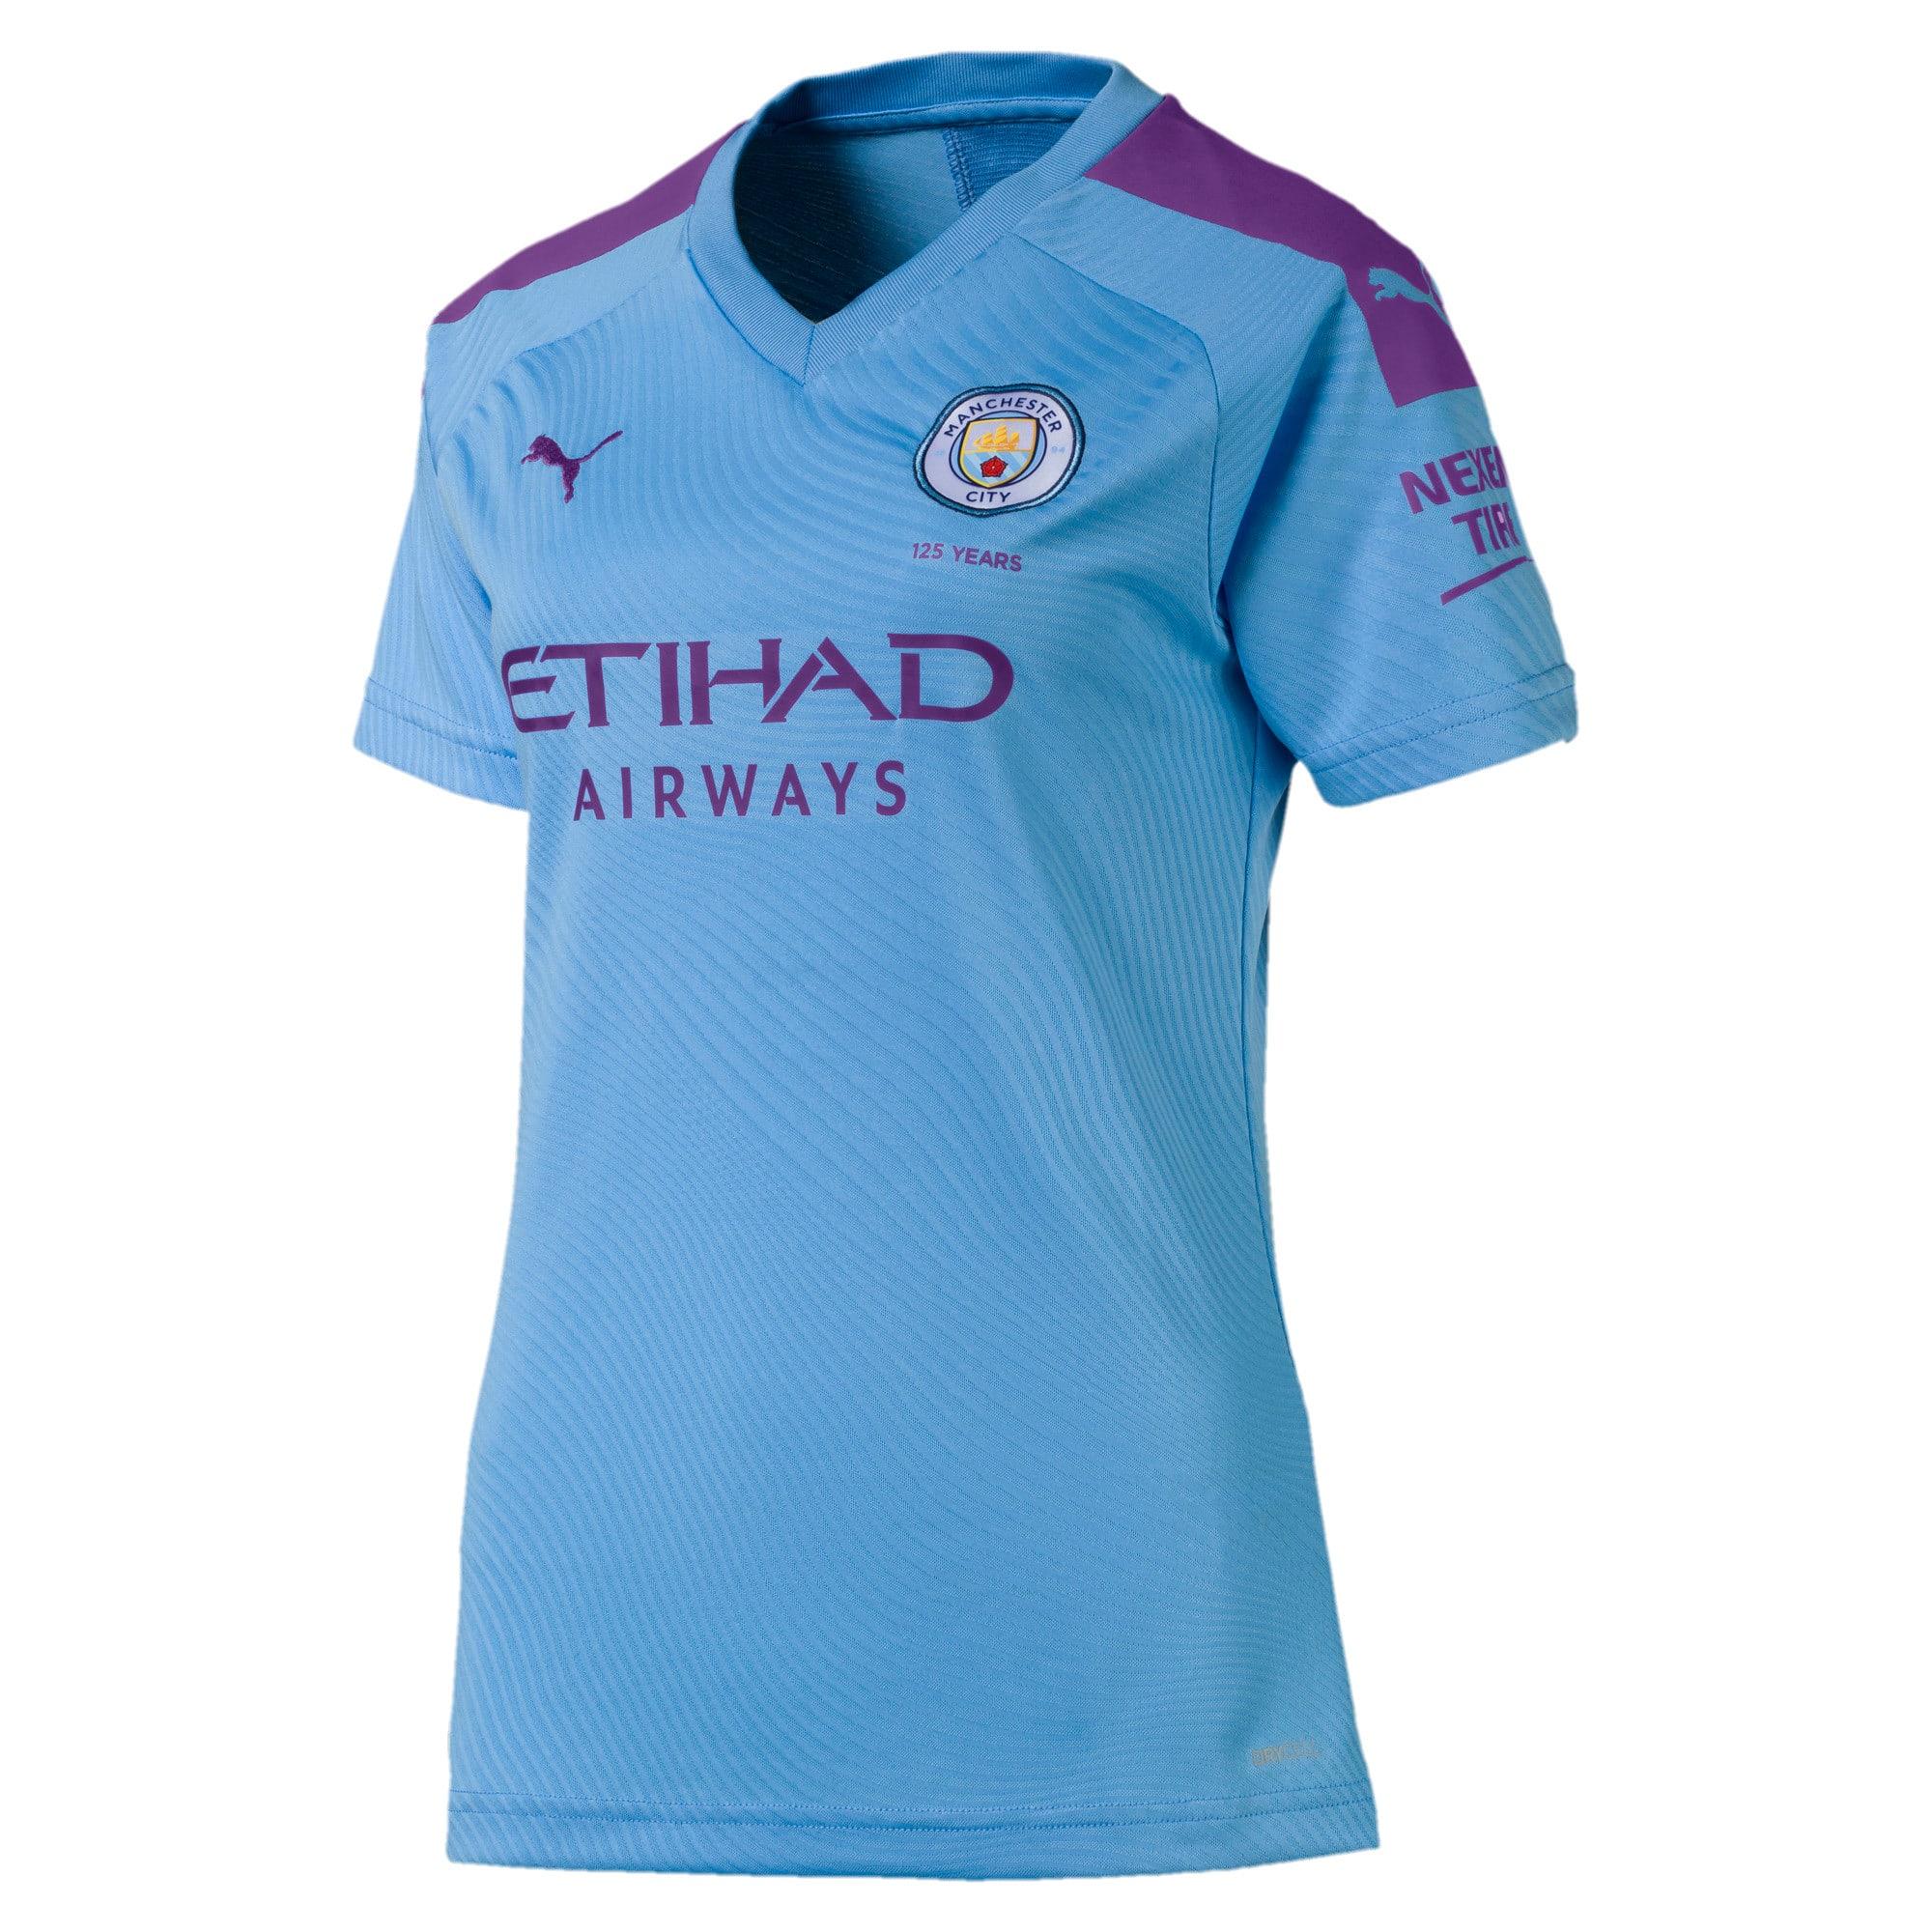 Thumbnail 1 of Manchester City FC Damen Replica Heimtrikot, TeamLightBlue-TillandsiaPurp, medium